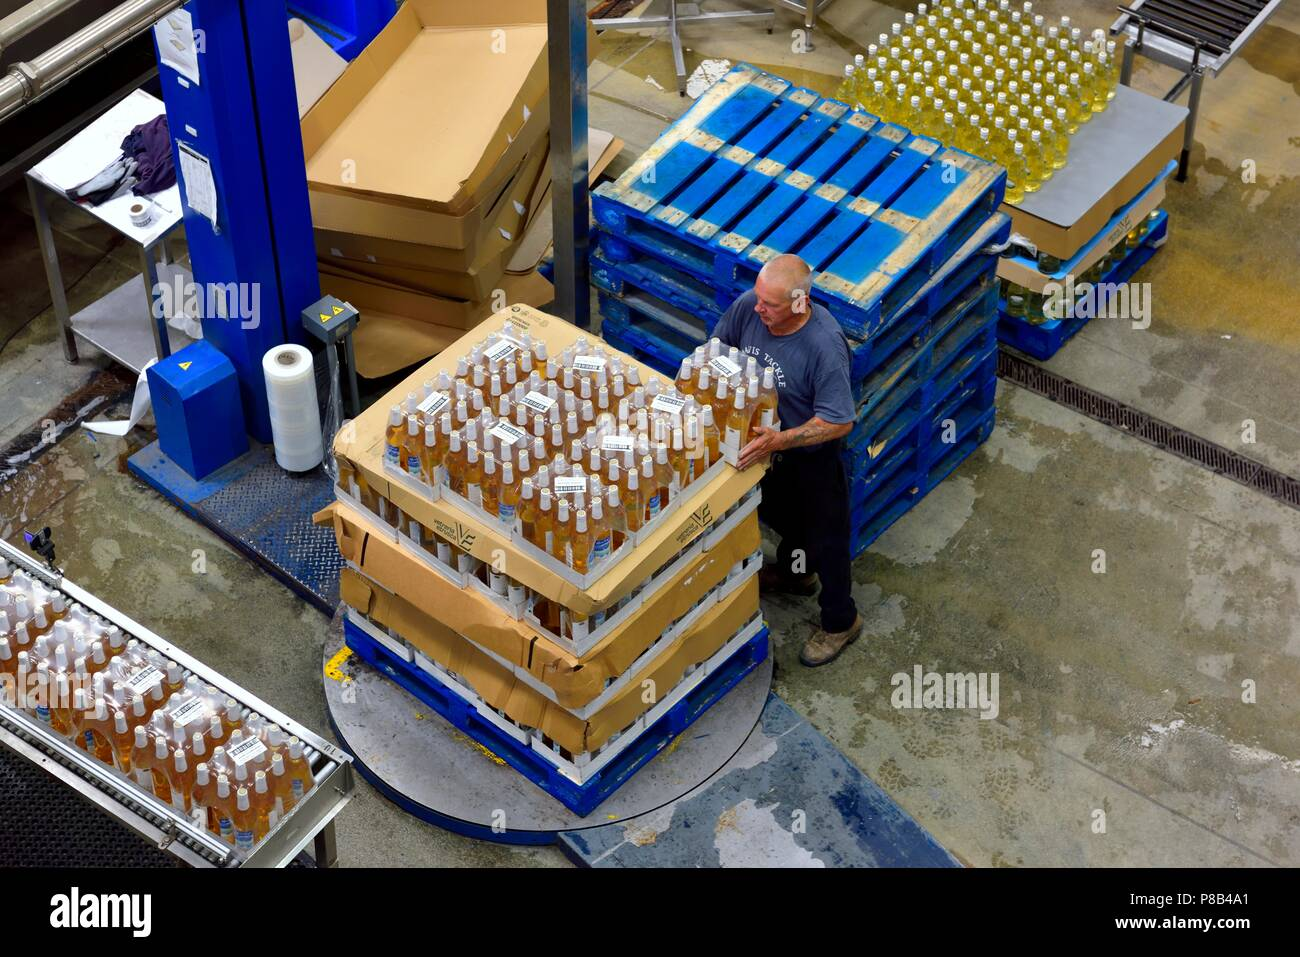 Man stacking cases on a pallet turntable, Healeys Cornish Cyder Farm,Penhallow, Truro,Cornwall,England,UK Stock Photo